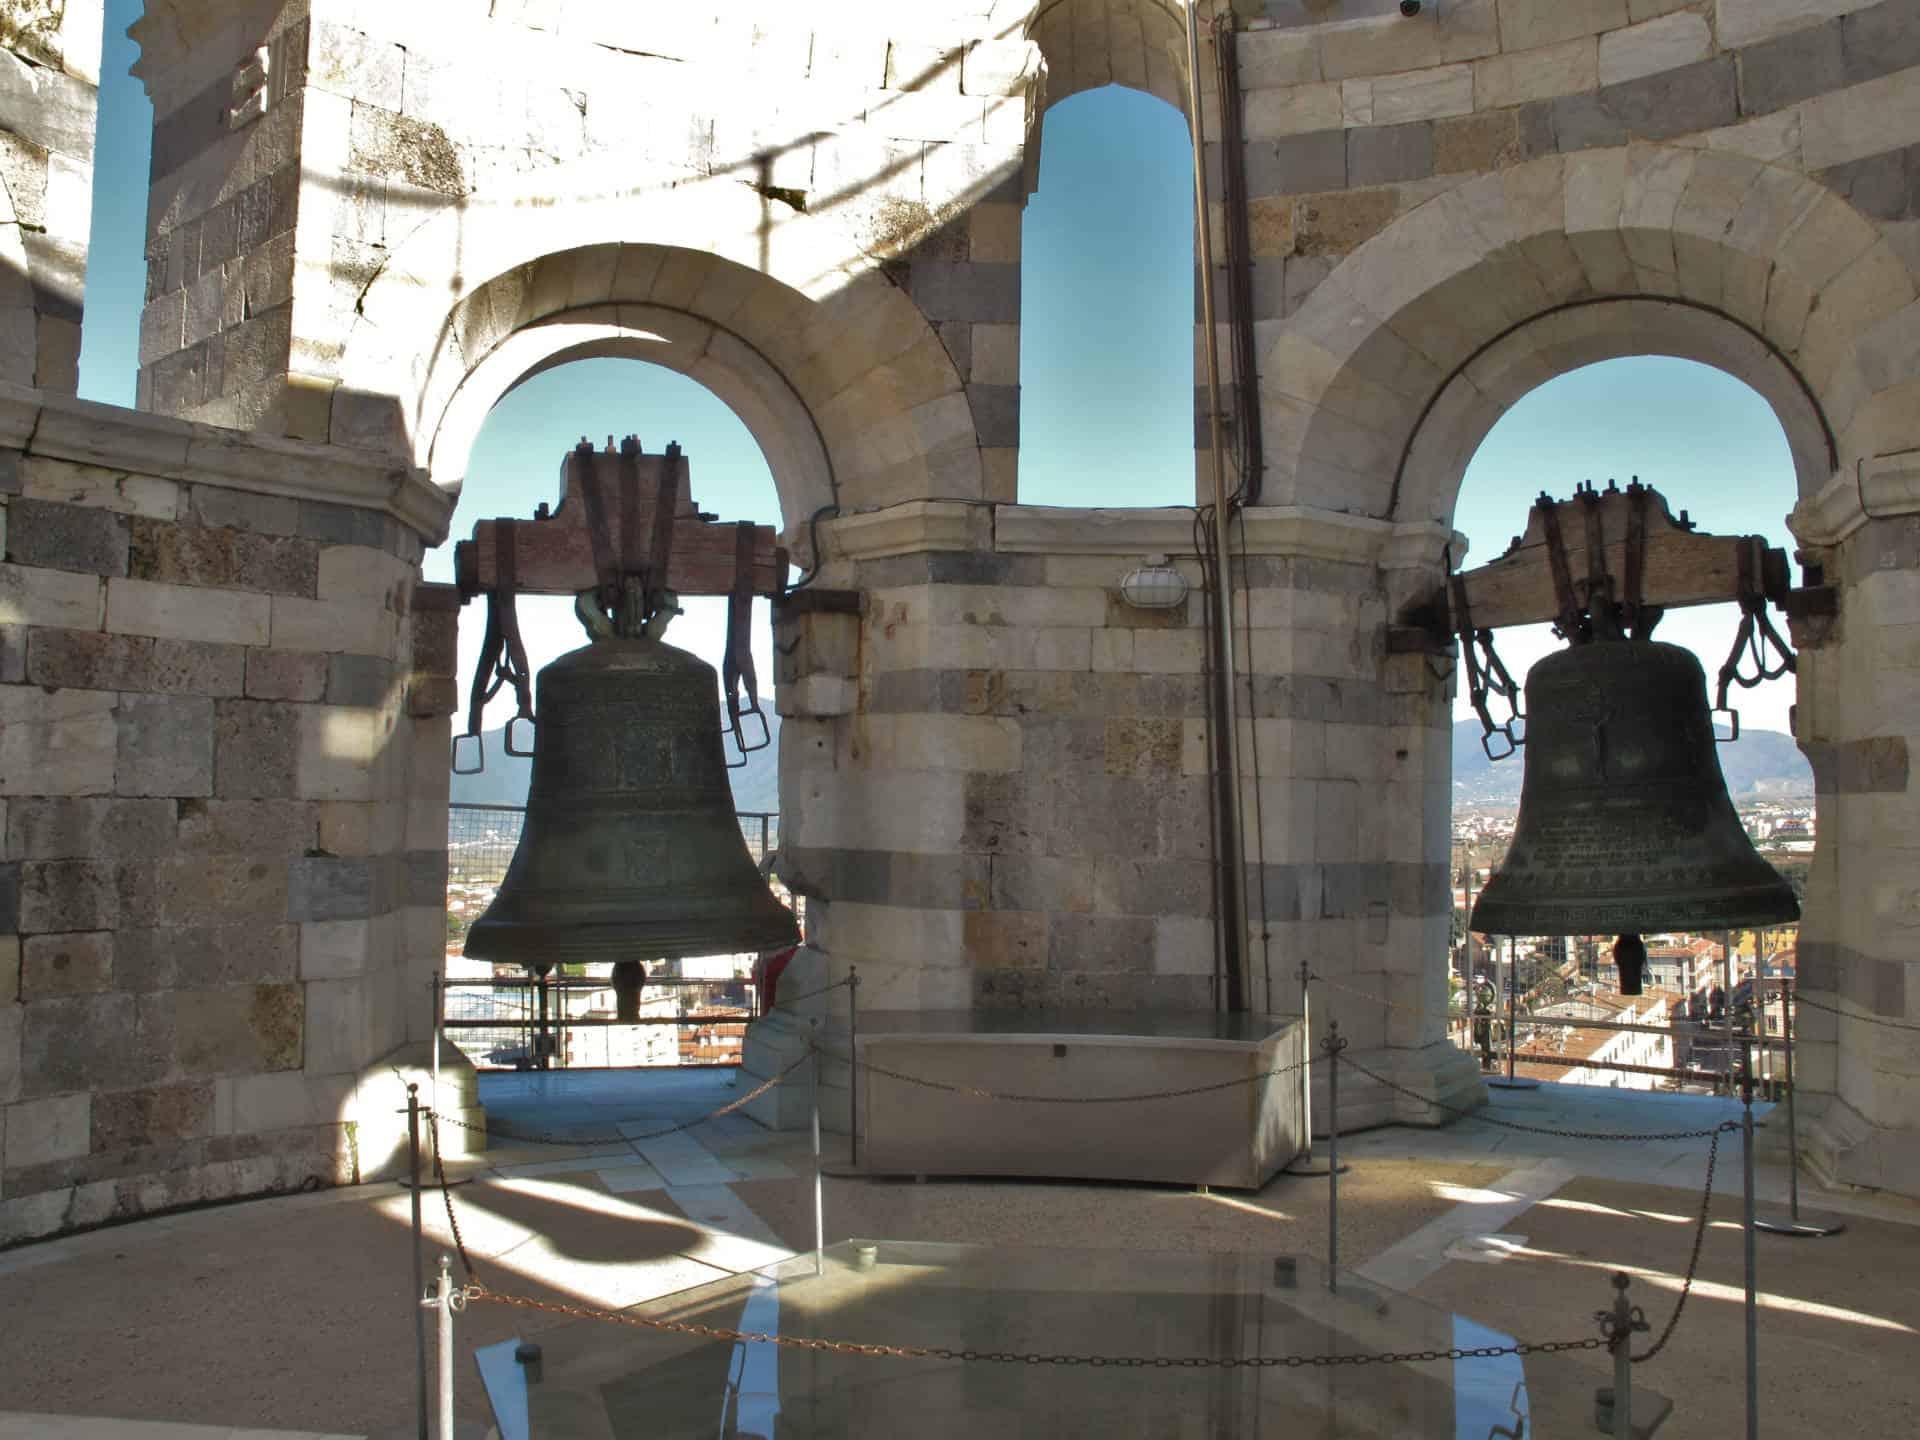 ekiros-visita-guidata-piazza-dei-miracoli-torre-pendente-cella-campanaria